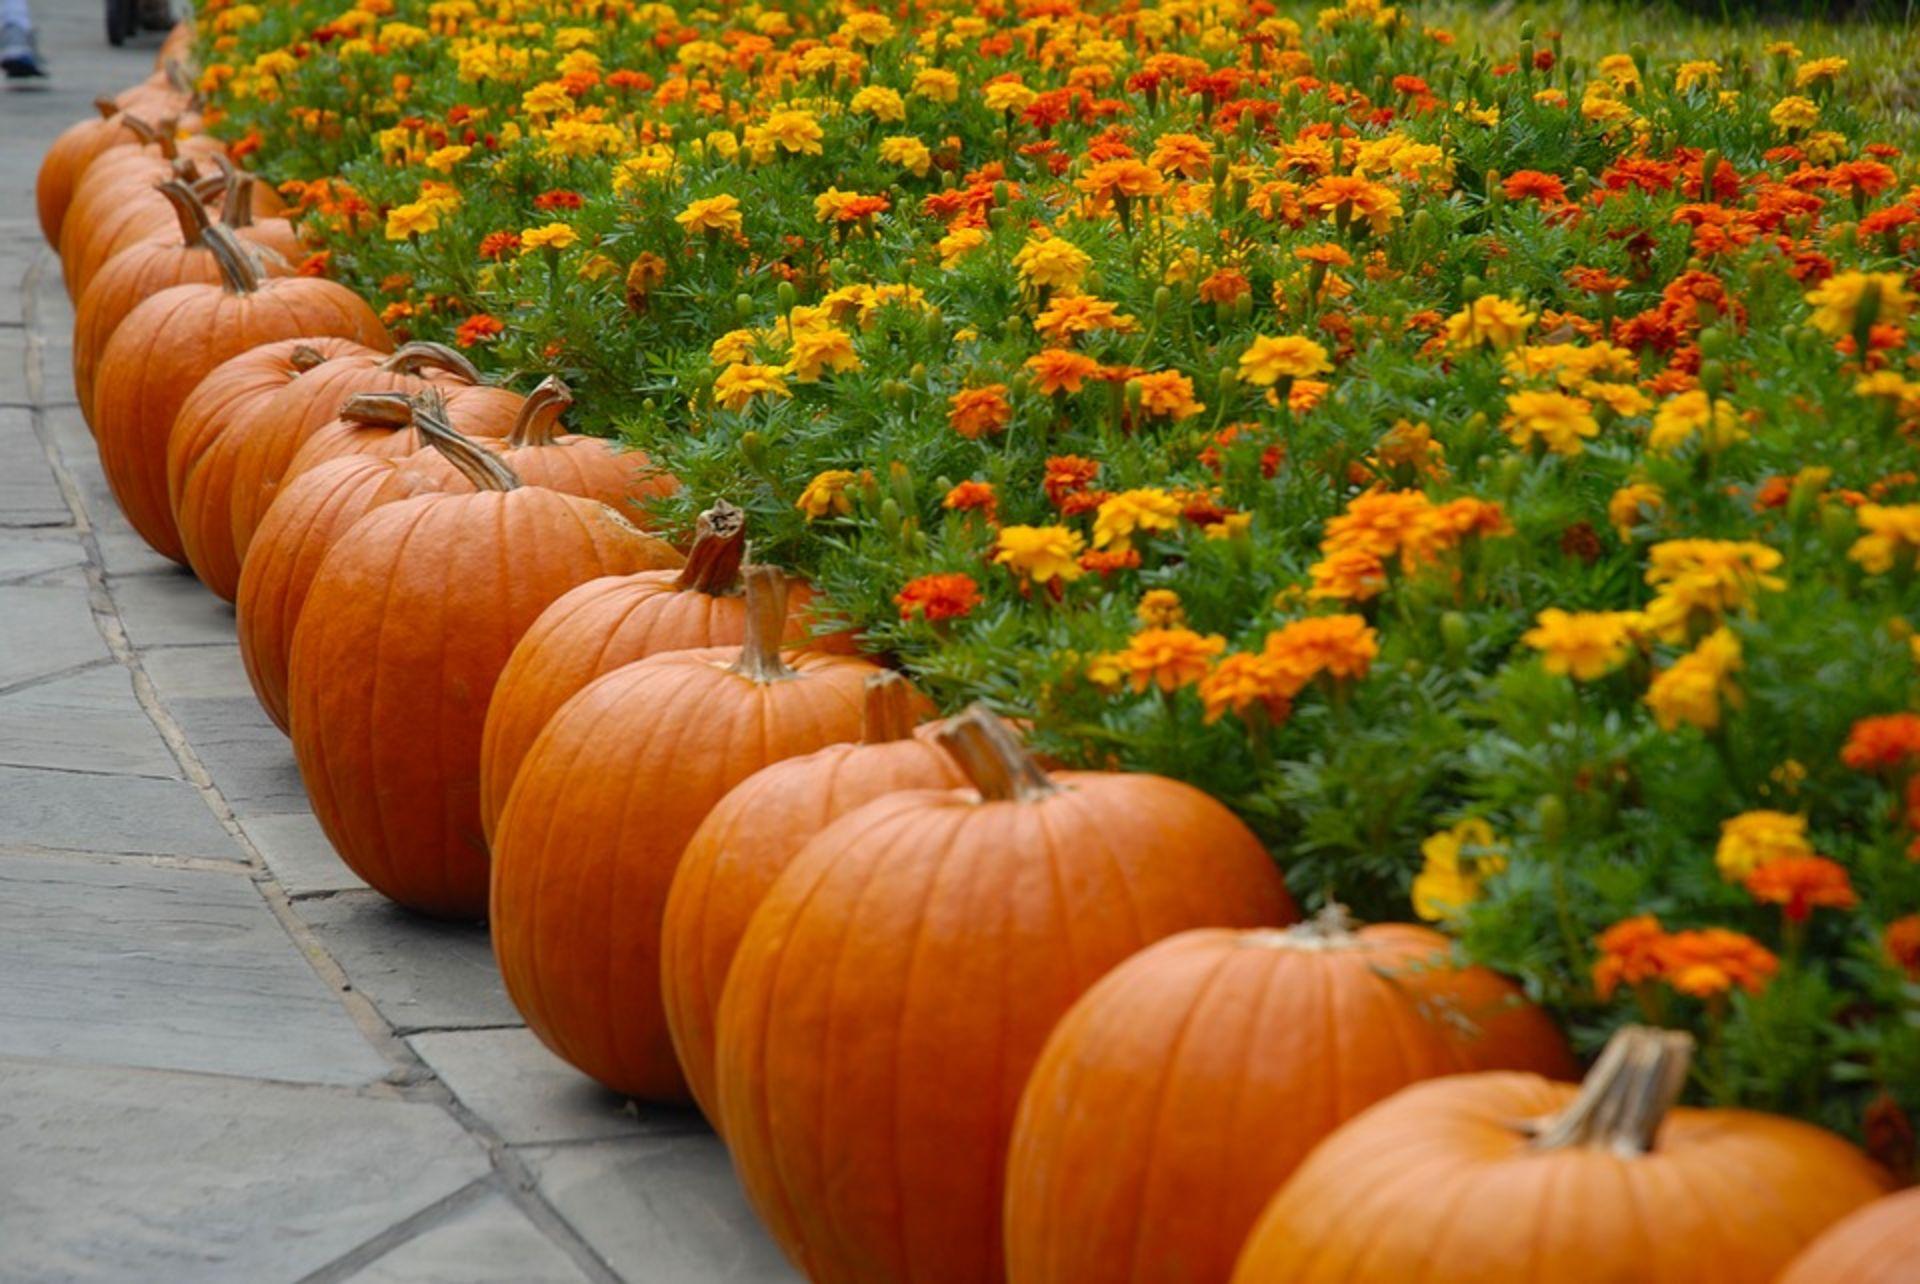 October in New Braunfels